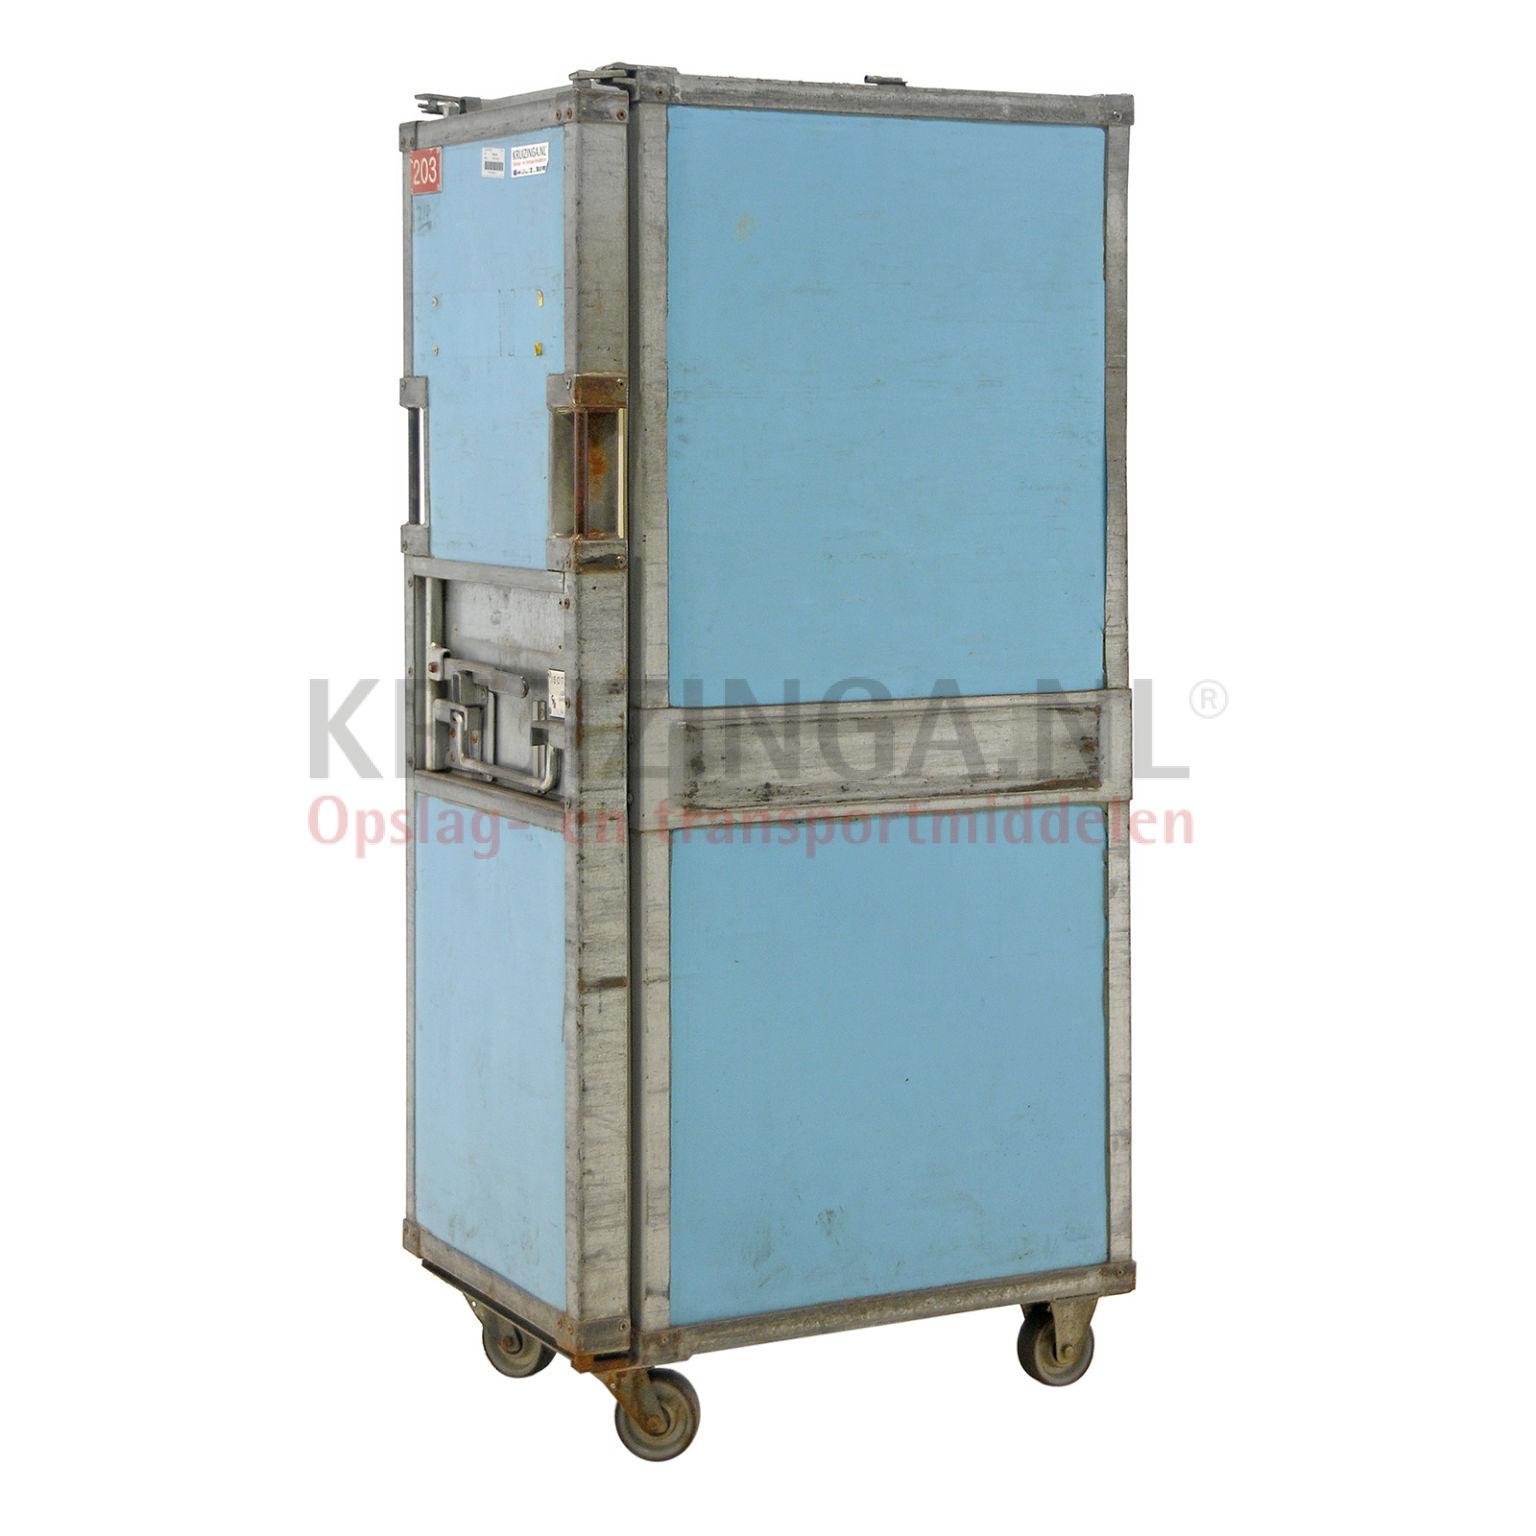 Roll conteneur conteneur mobile thermo construction for Conteneur construction